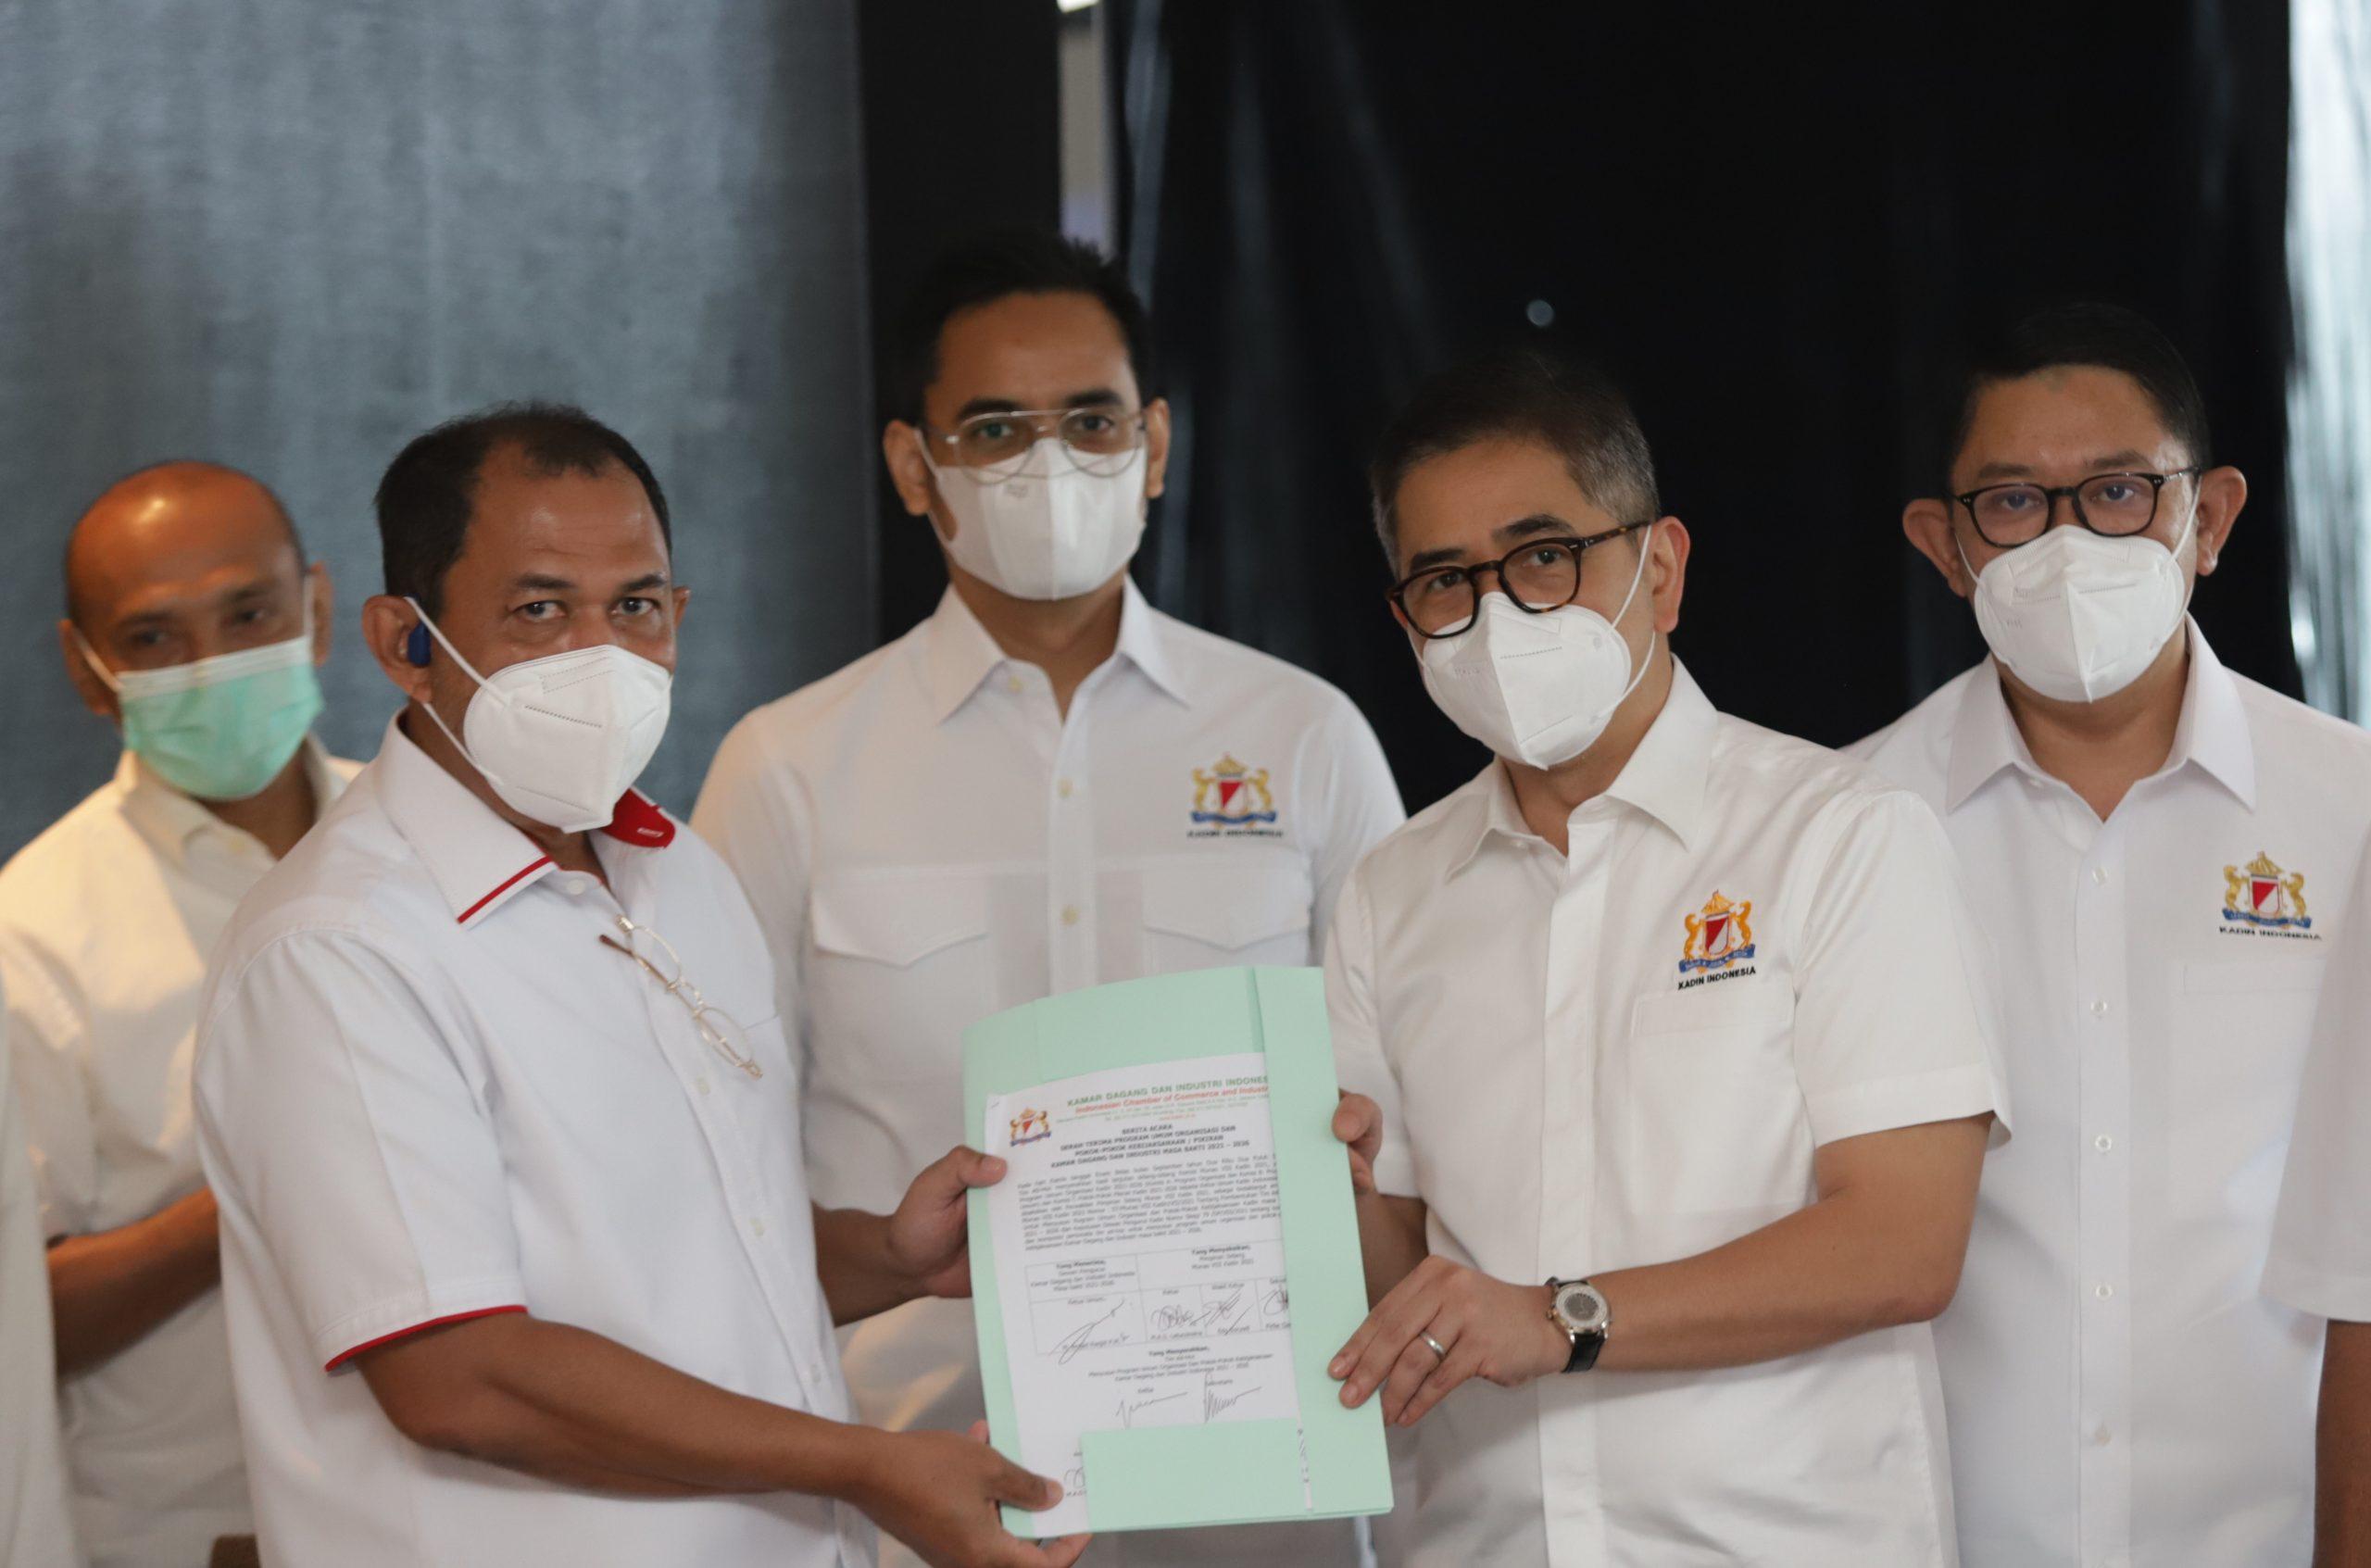 KETUA Tim Ad Hoc, Juni Ardianto Rachman (kiri) menyerahkan Program Umum Organisasi dan Pokok-Pokok Kebijaksanaan Kadin 2021 – 2026 kepada Ketum Kadin Indonesia, Arsjad Rasjid (kanan) di Hotel Westin, Jakarta, Kamis (16/9/2021). Foto: ist